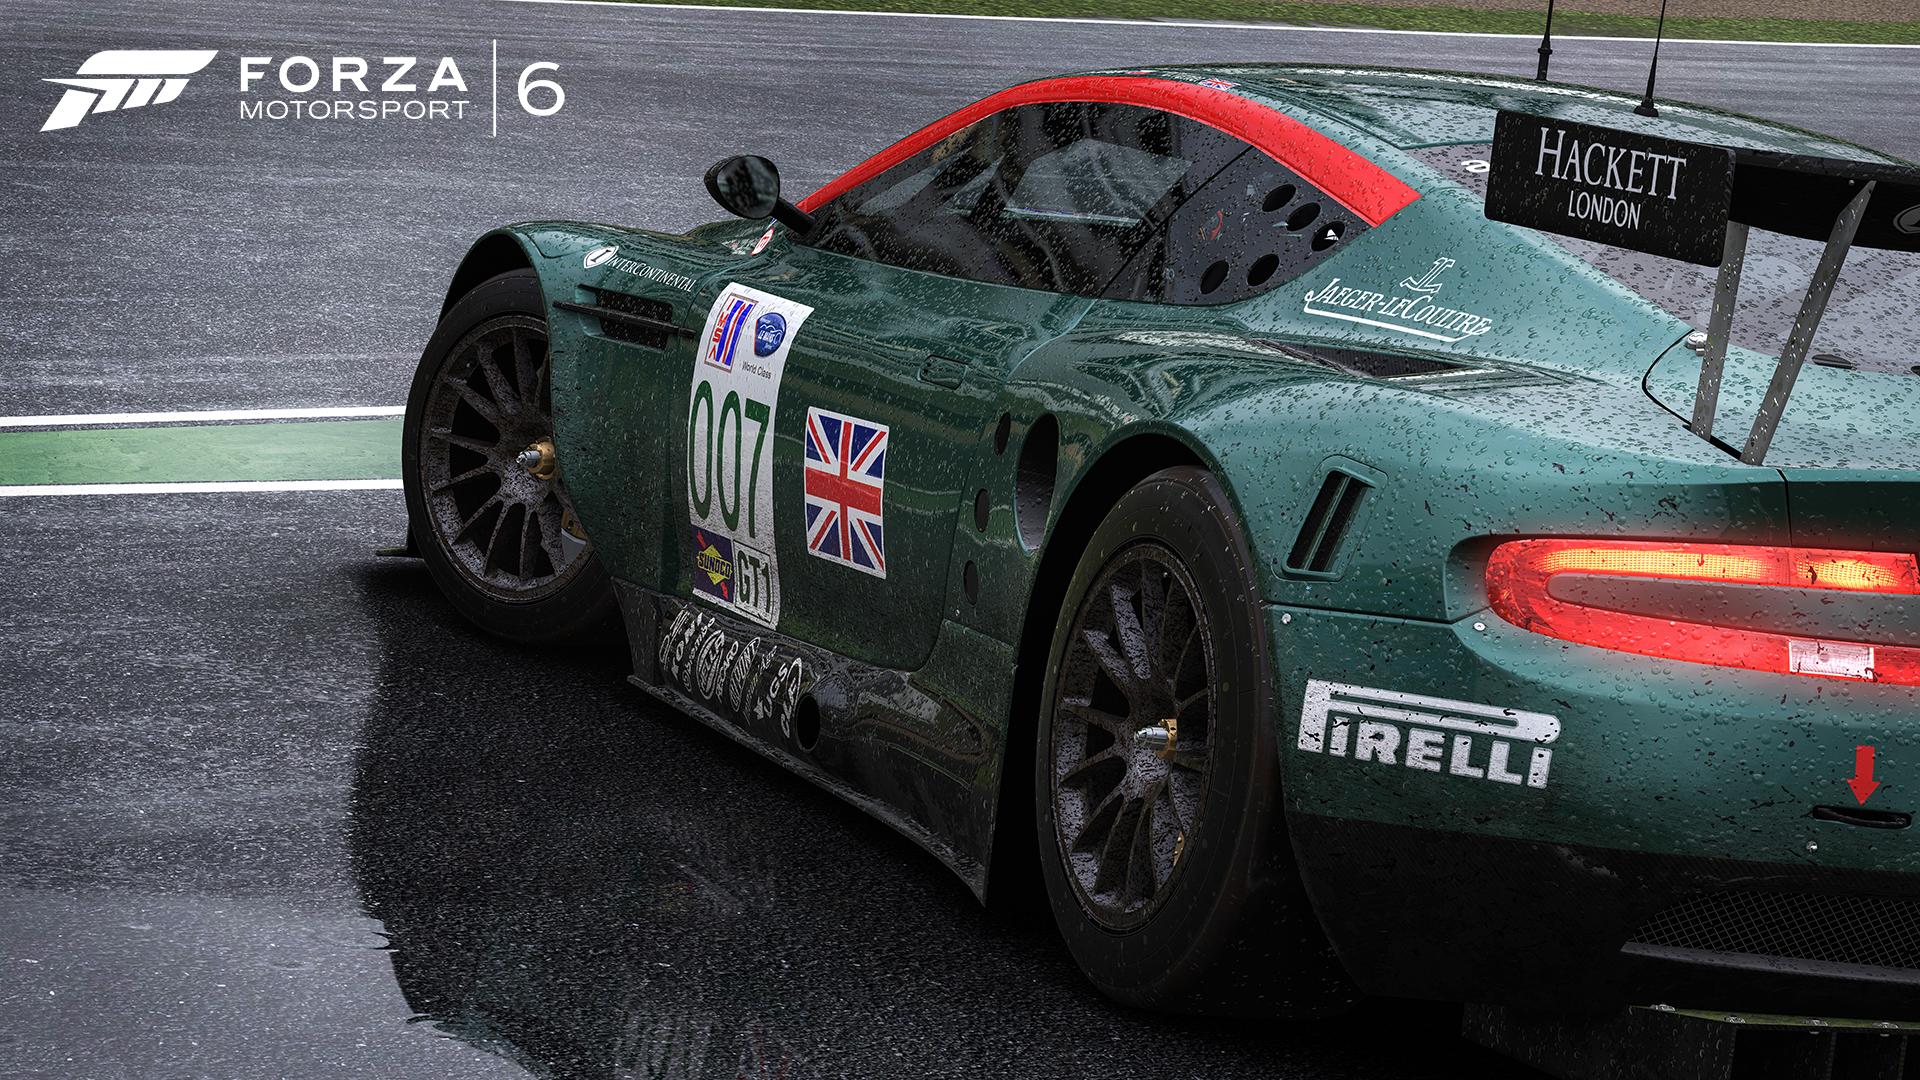 Forza Motorsport 6 - Aston Martin race car